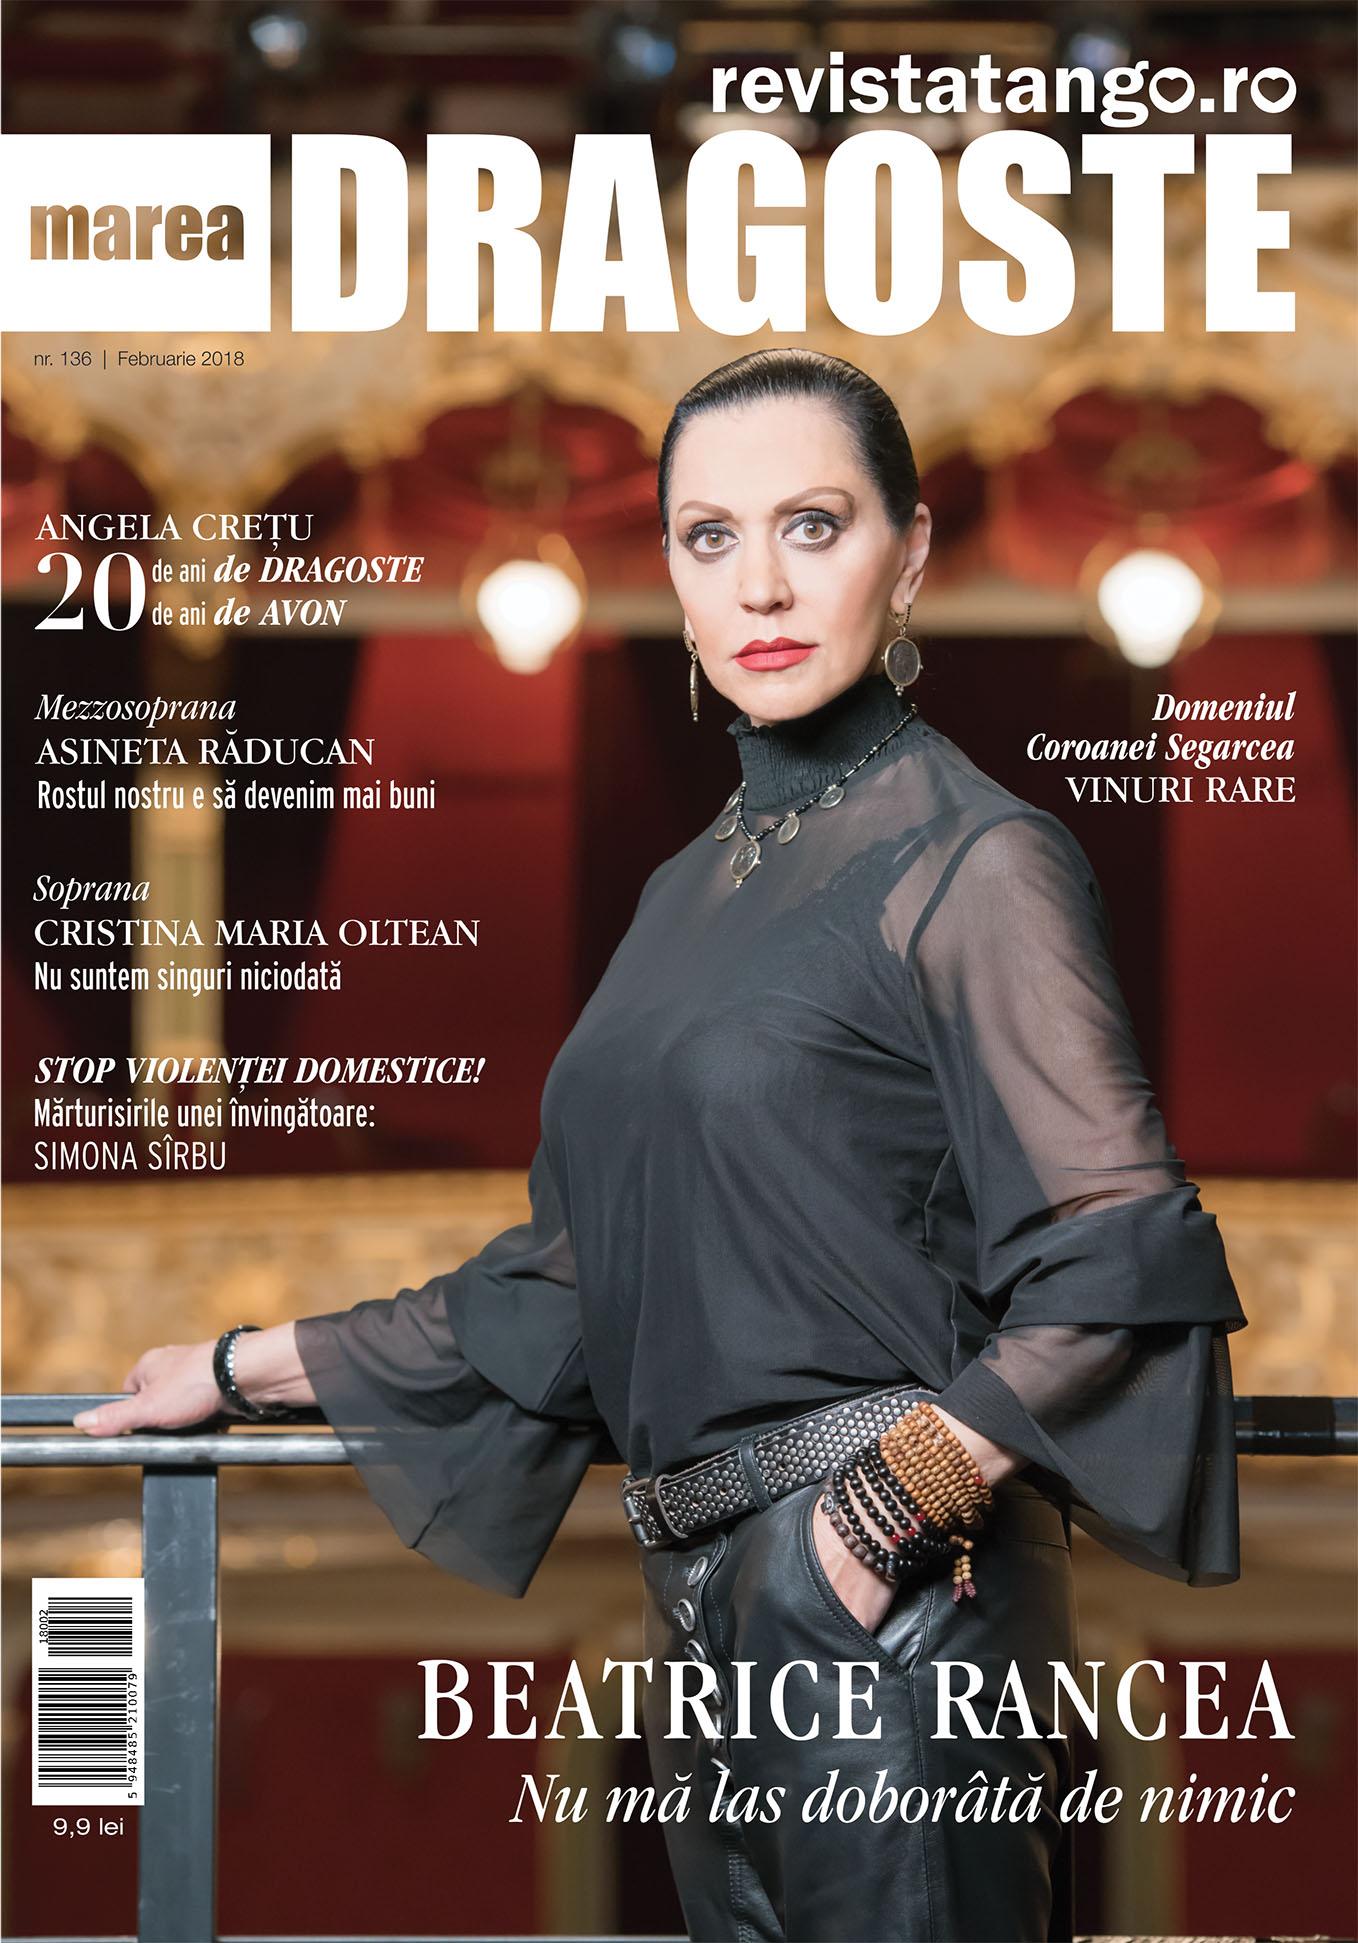 Beatrice Rancea pe coperta Marea Dragoste-revistatango.ro, nr. 136, februarie 2018